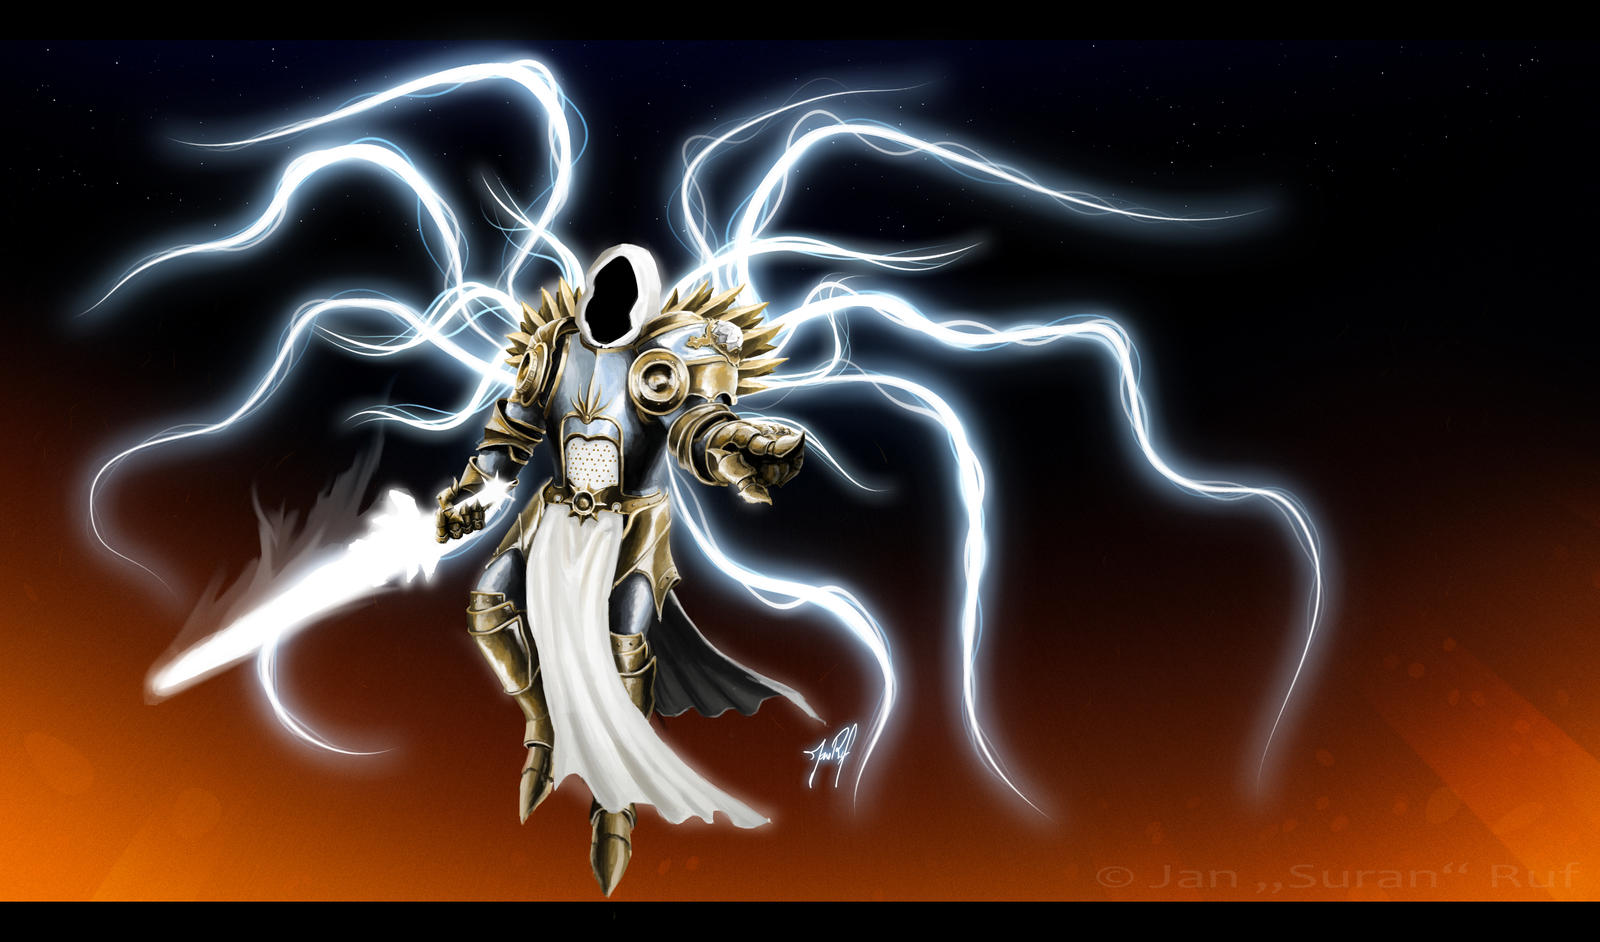 Archangel Tyrael By Suran329 On DeviantArt